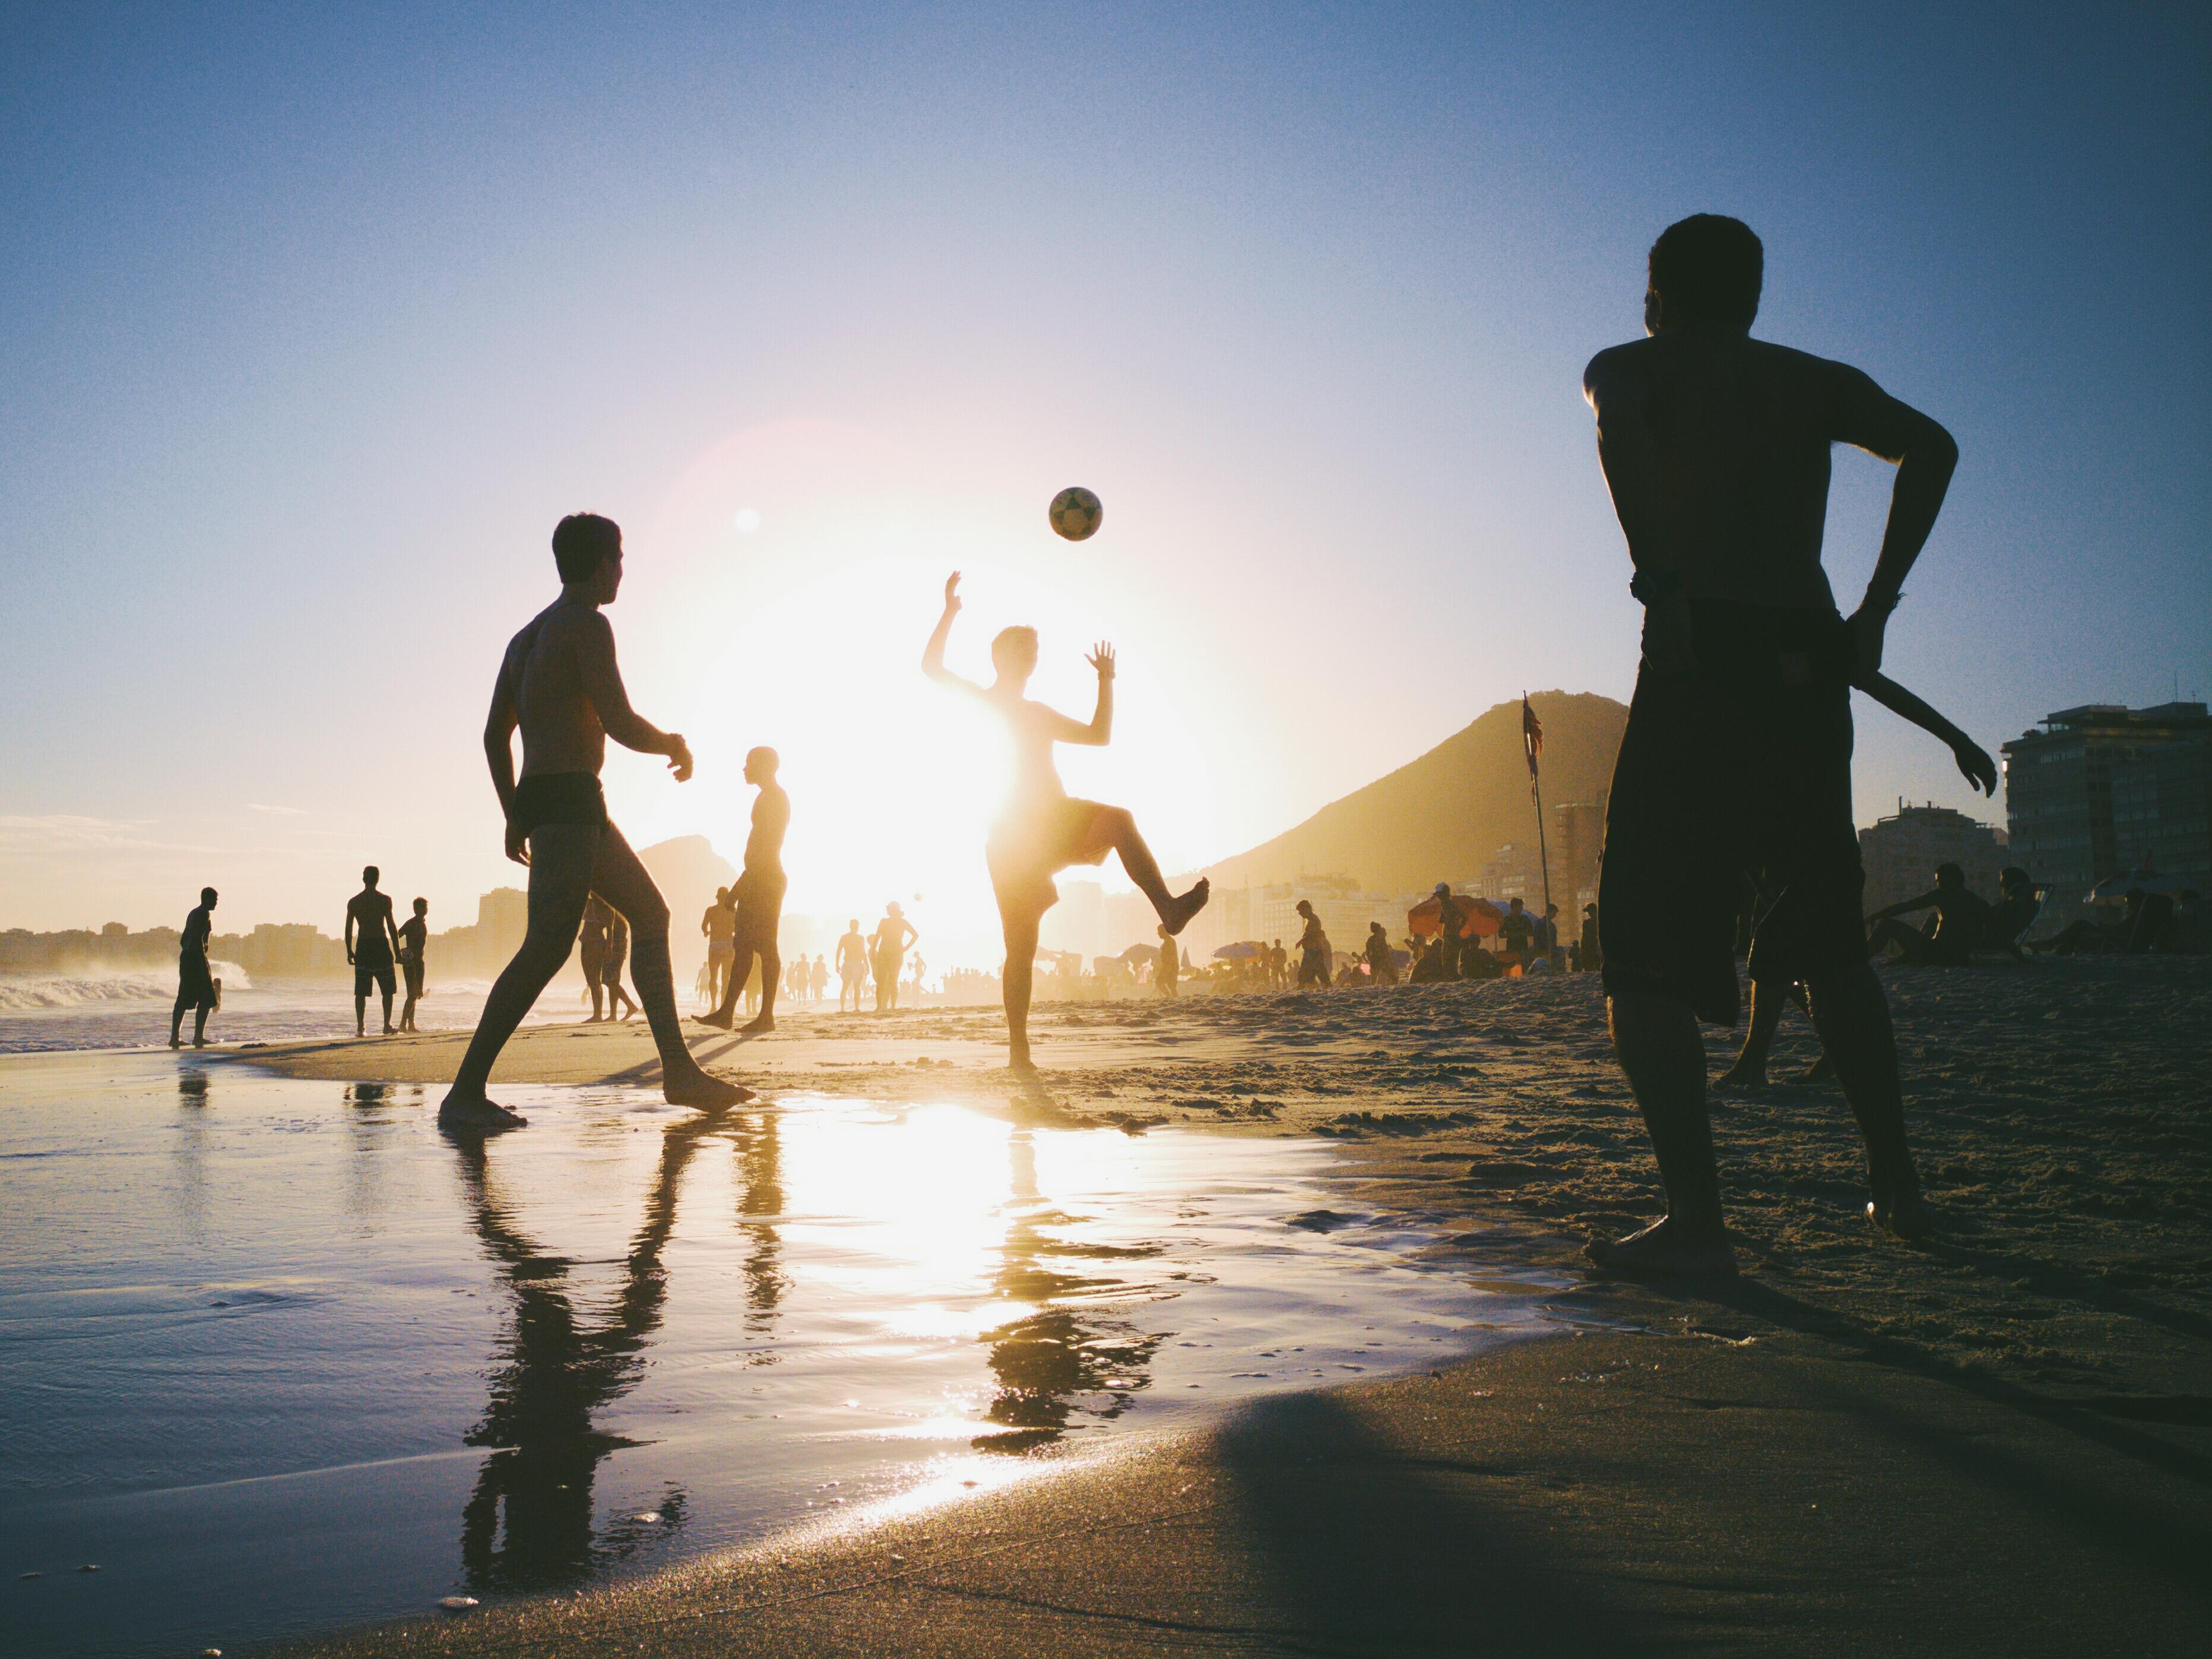 Soccer - OnePlus3T - Copacabana beach, Rio de Janeiro.jpg